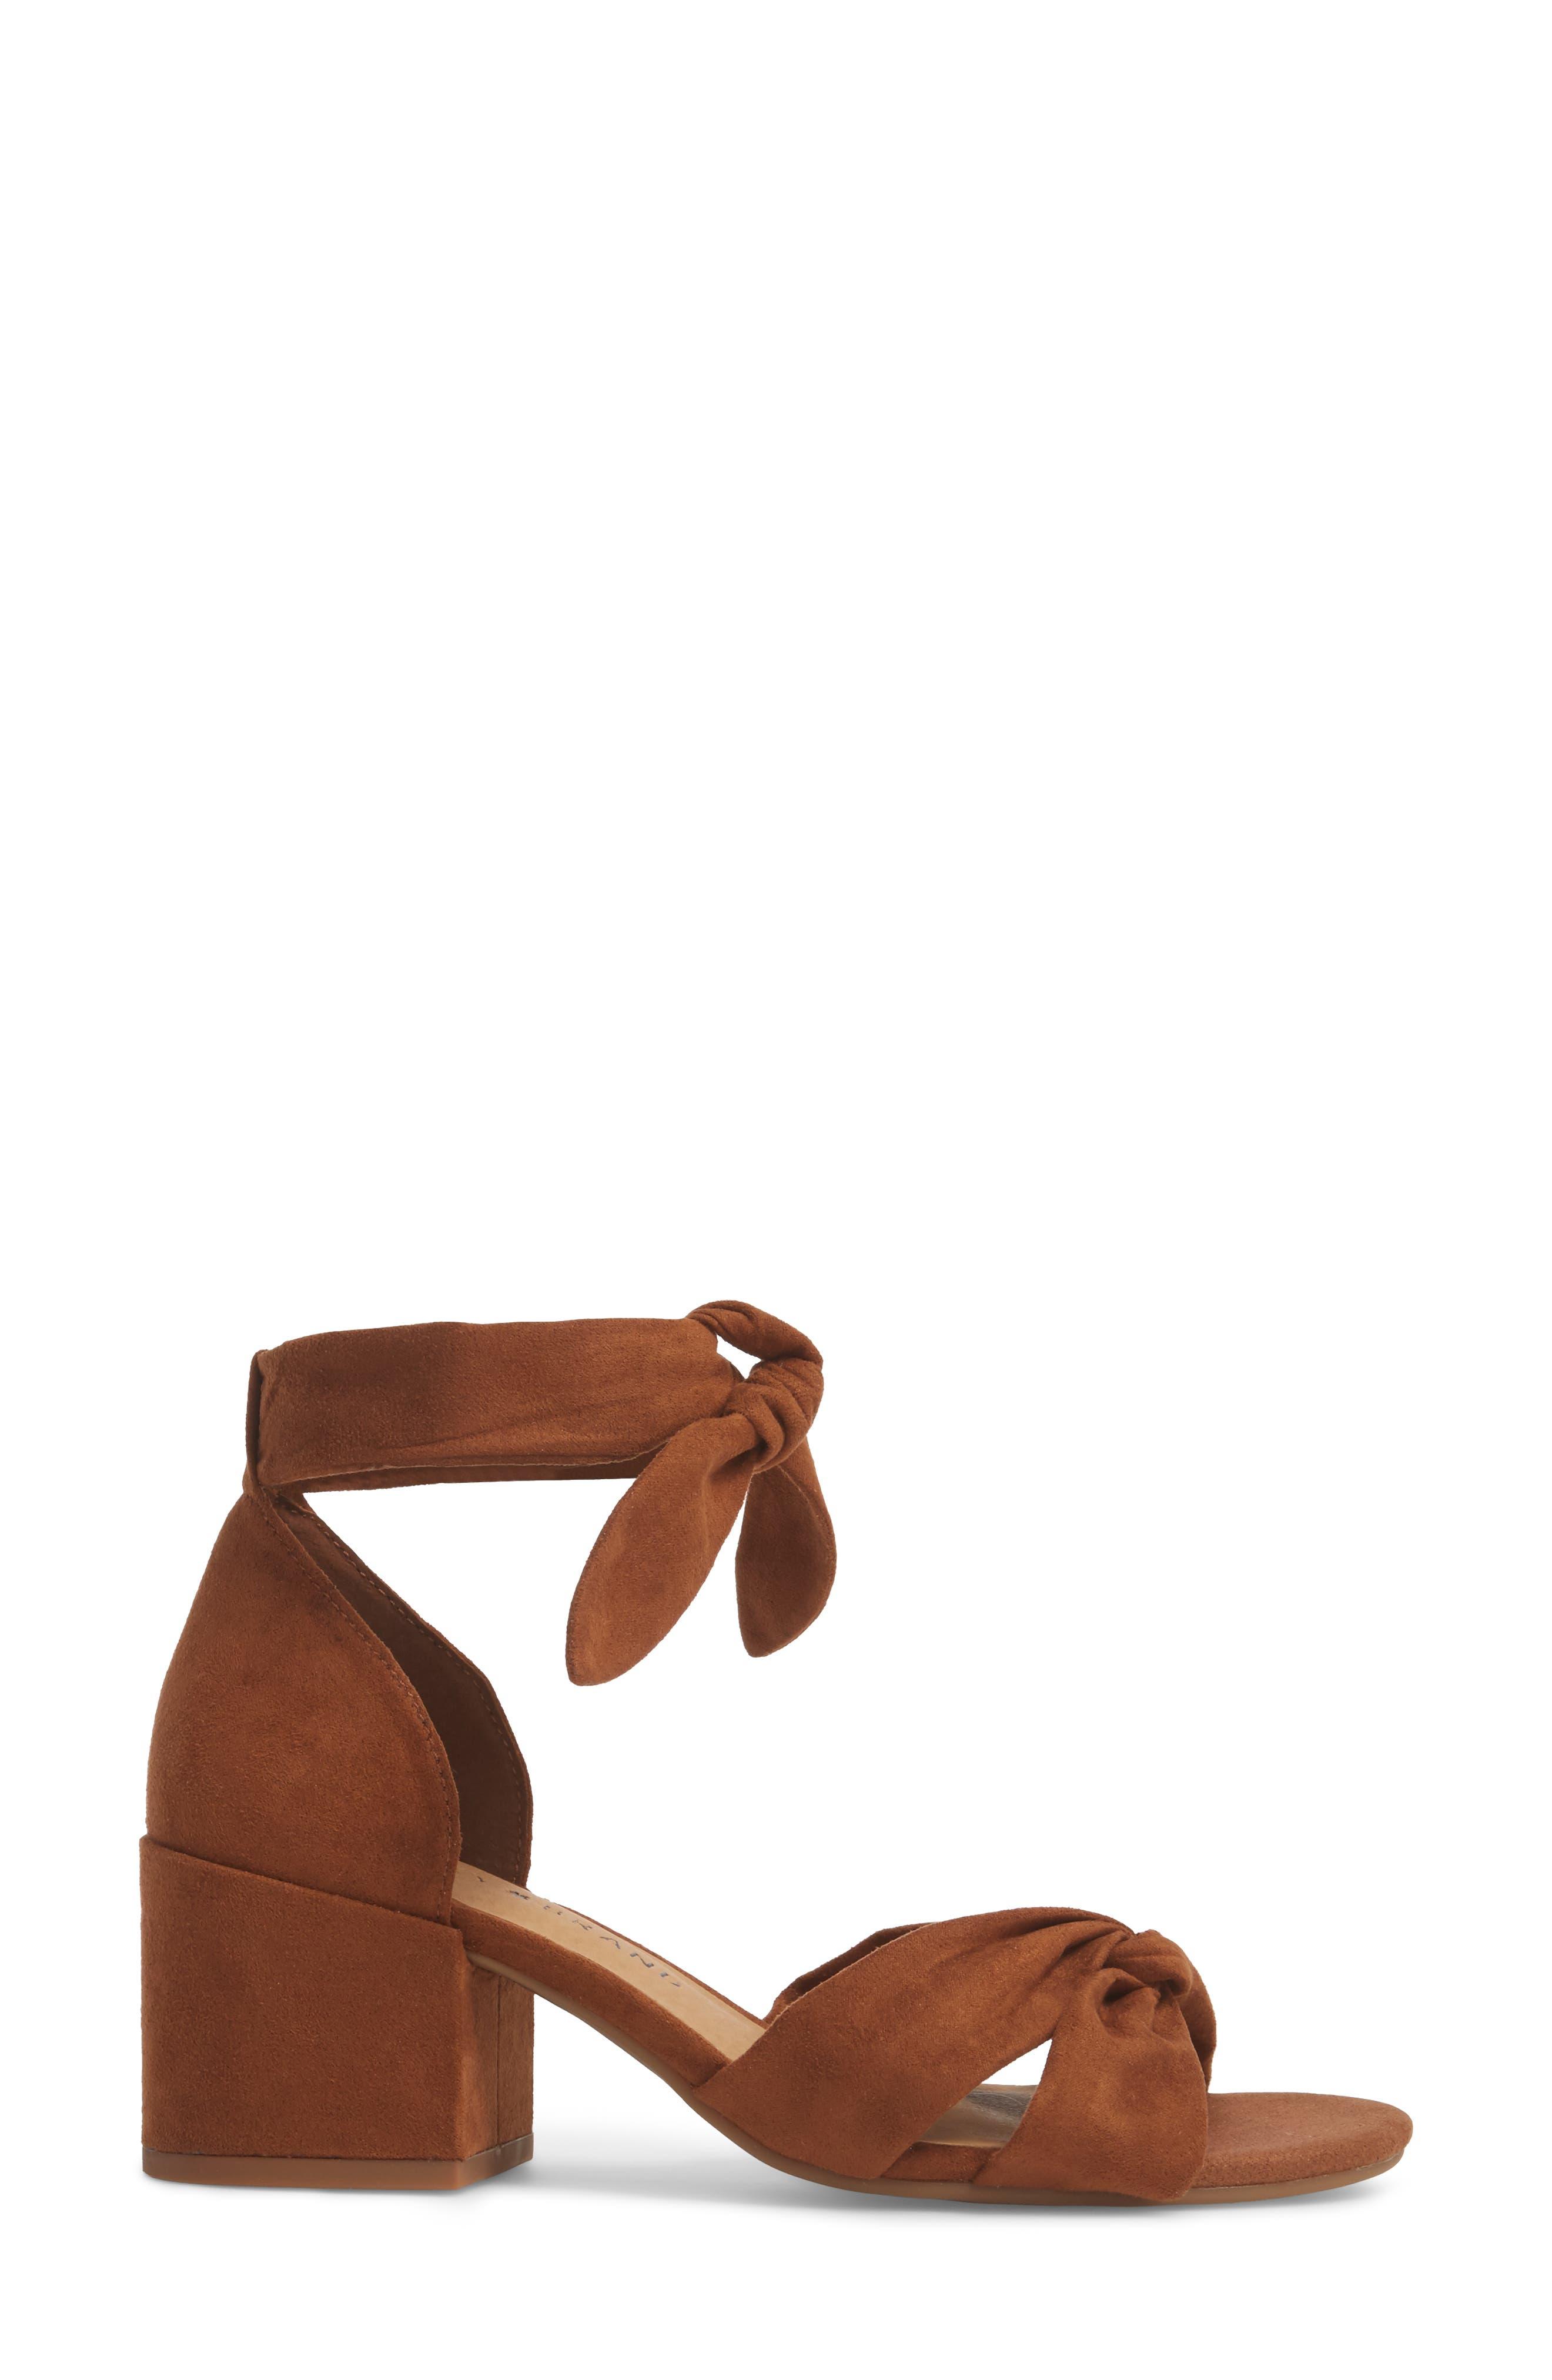 Xaylah Ankle Strap Sandal,                             Alternate thumbnail 3, color,                             Cedar Leather